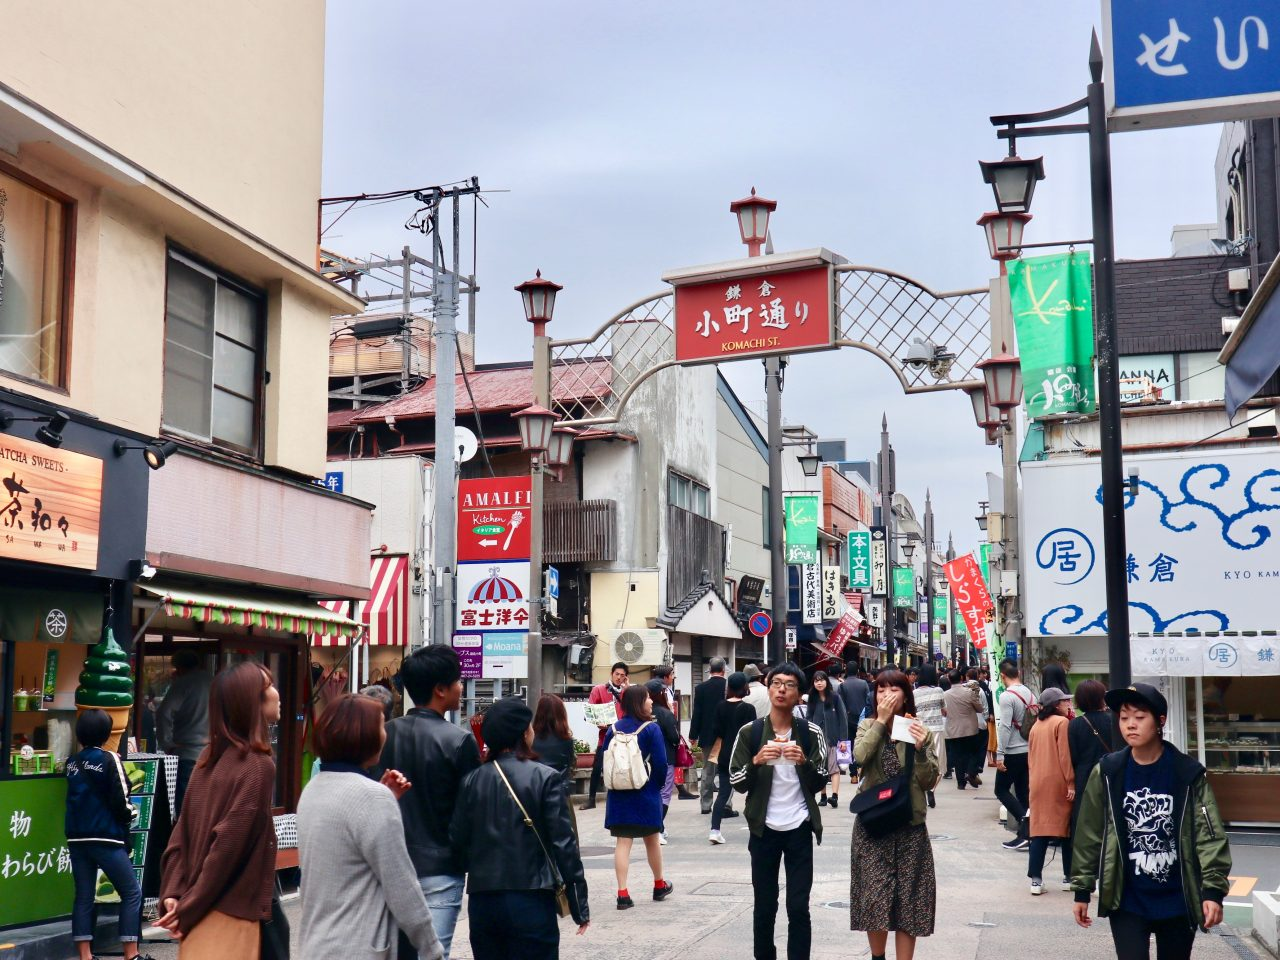 4 Spot Keren di Komachi Street, Jepang, Ada Kawasan Kuliner Ice Cream Unik